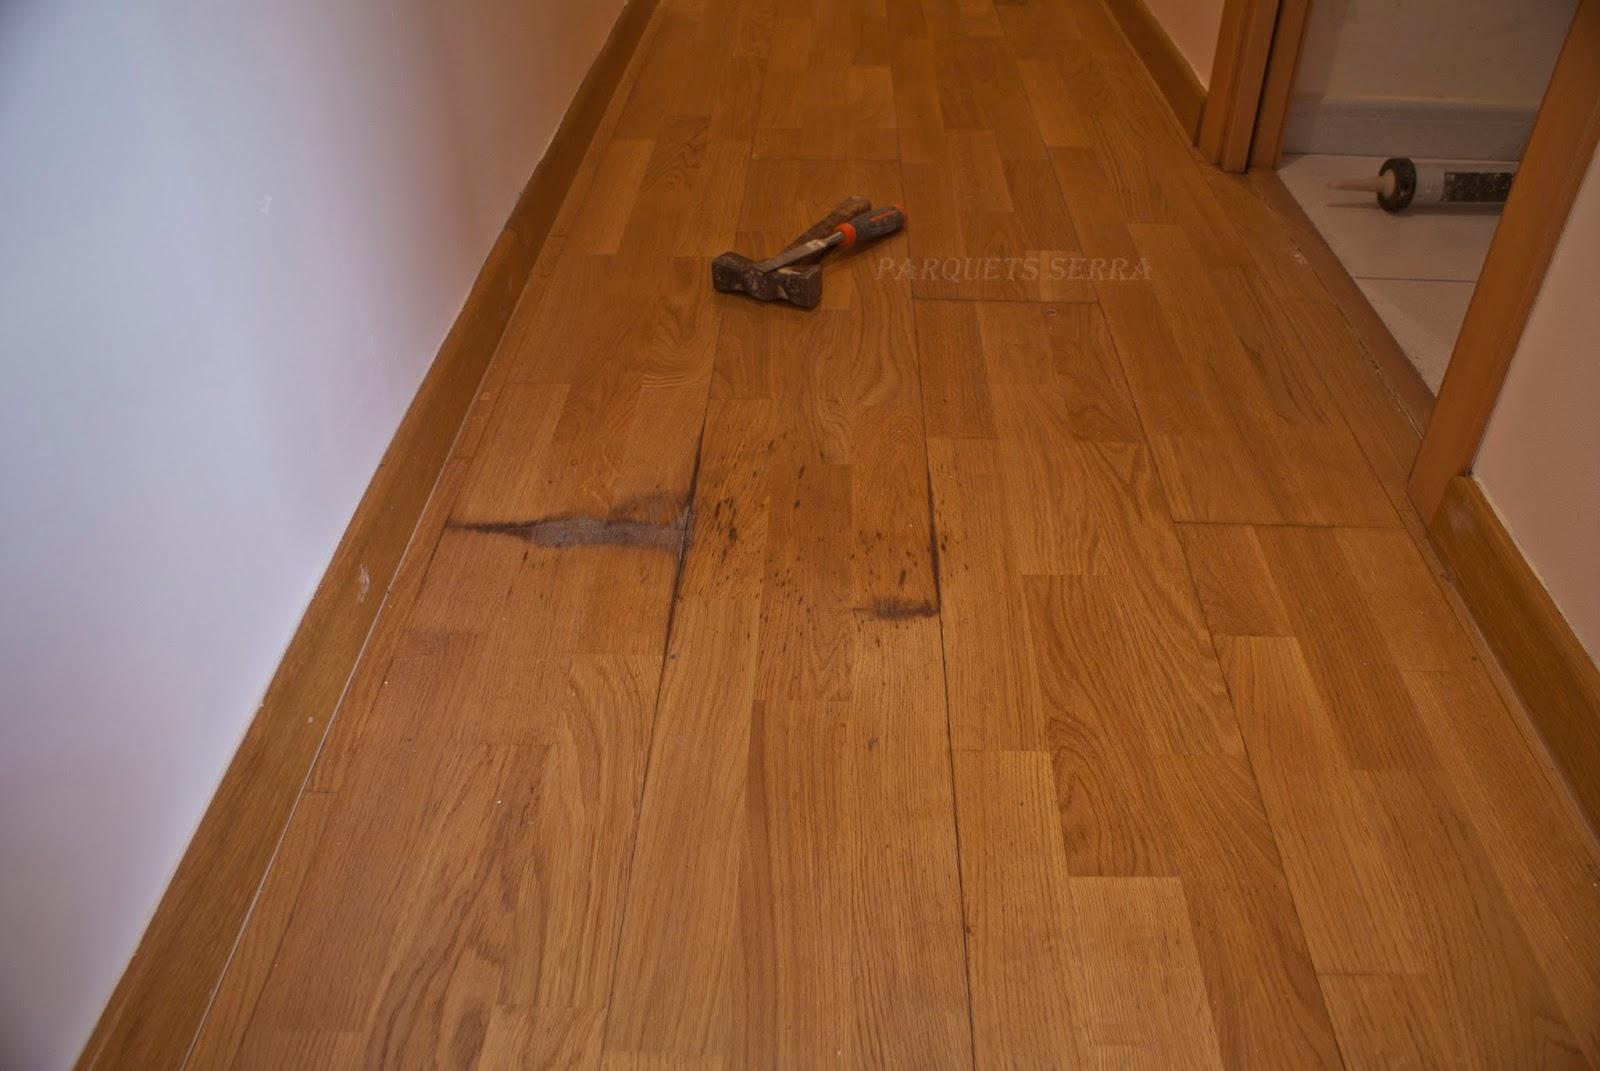 Reparar un parquet - Reparar piso parquet ...